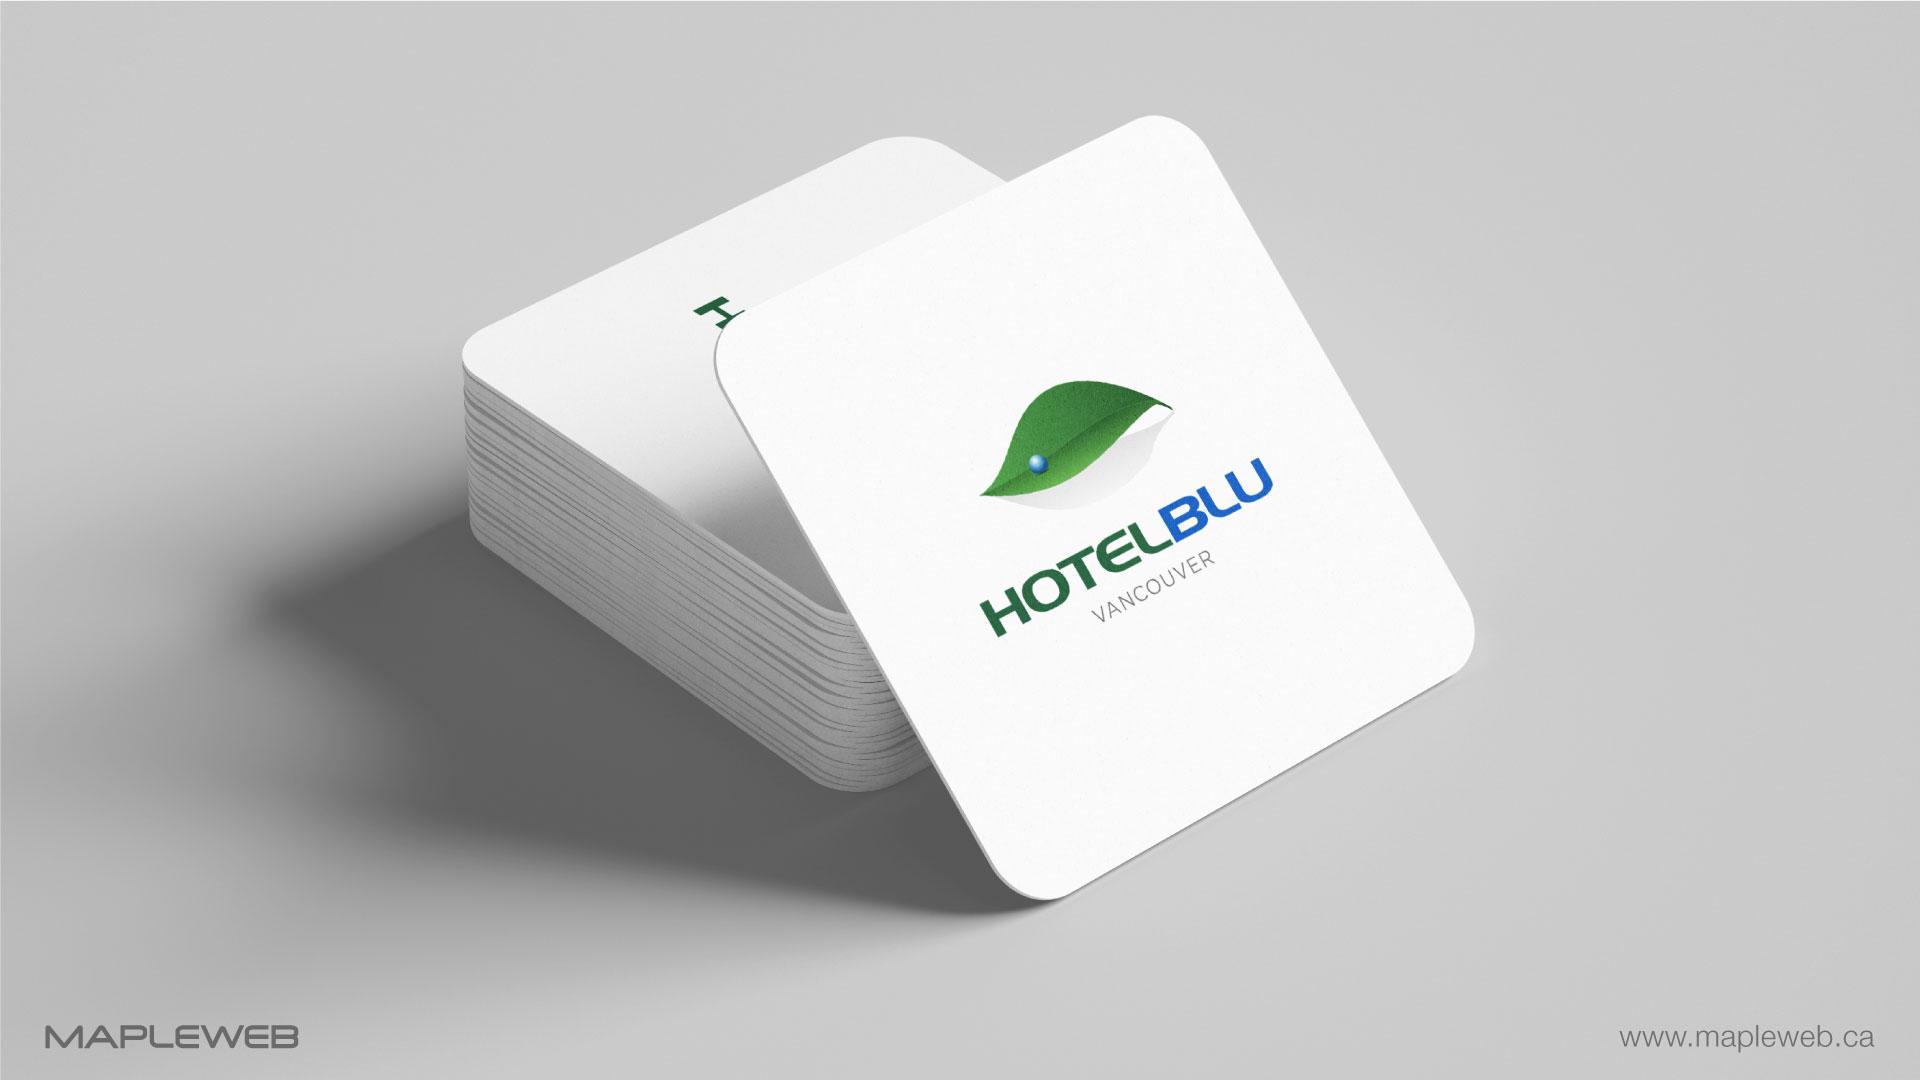 hotel-blu-brand-logo-design-by-mapleweb-vancouver-canada-white-rectangular-card-mock